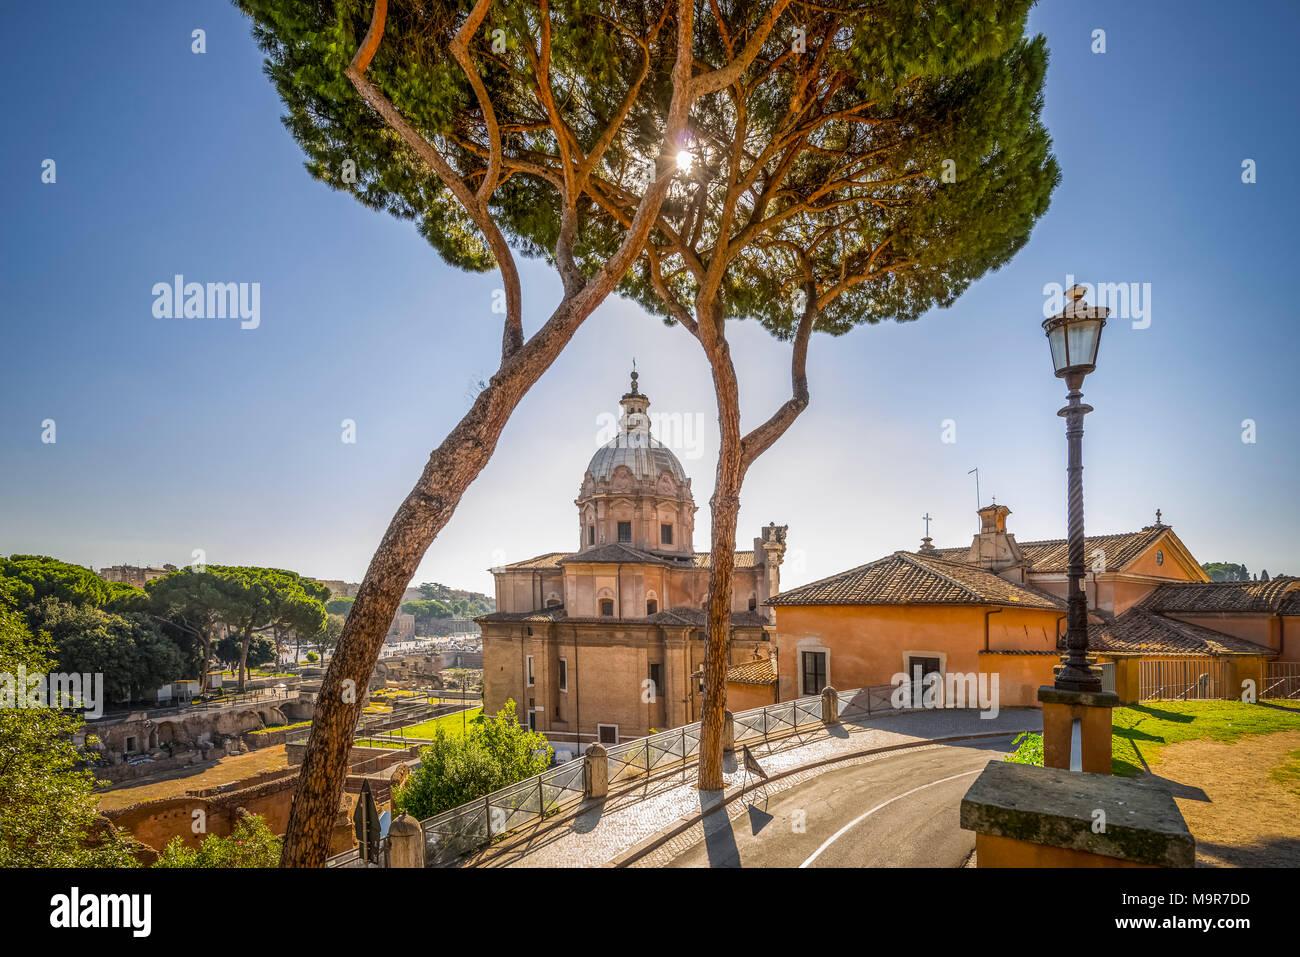 Europa, Italien, Rom, Forum Romanum, Santi Luca e Martina - Stock Image